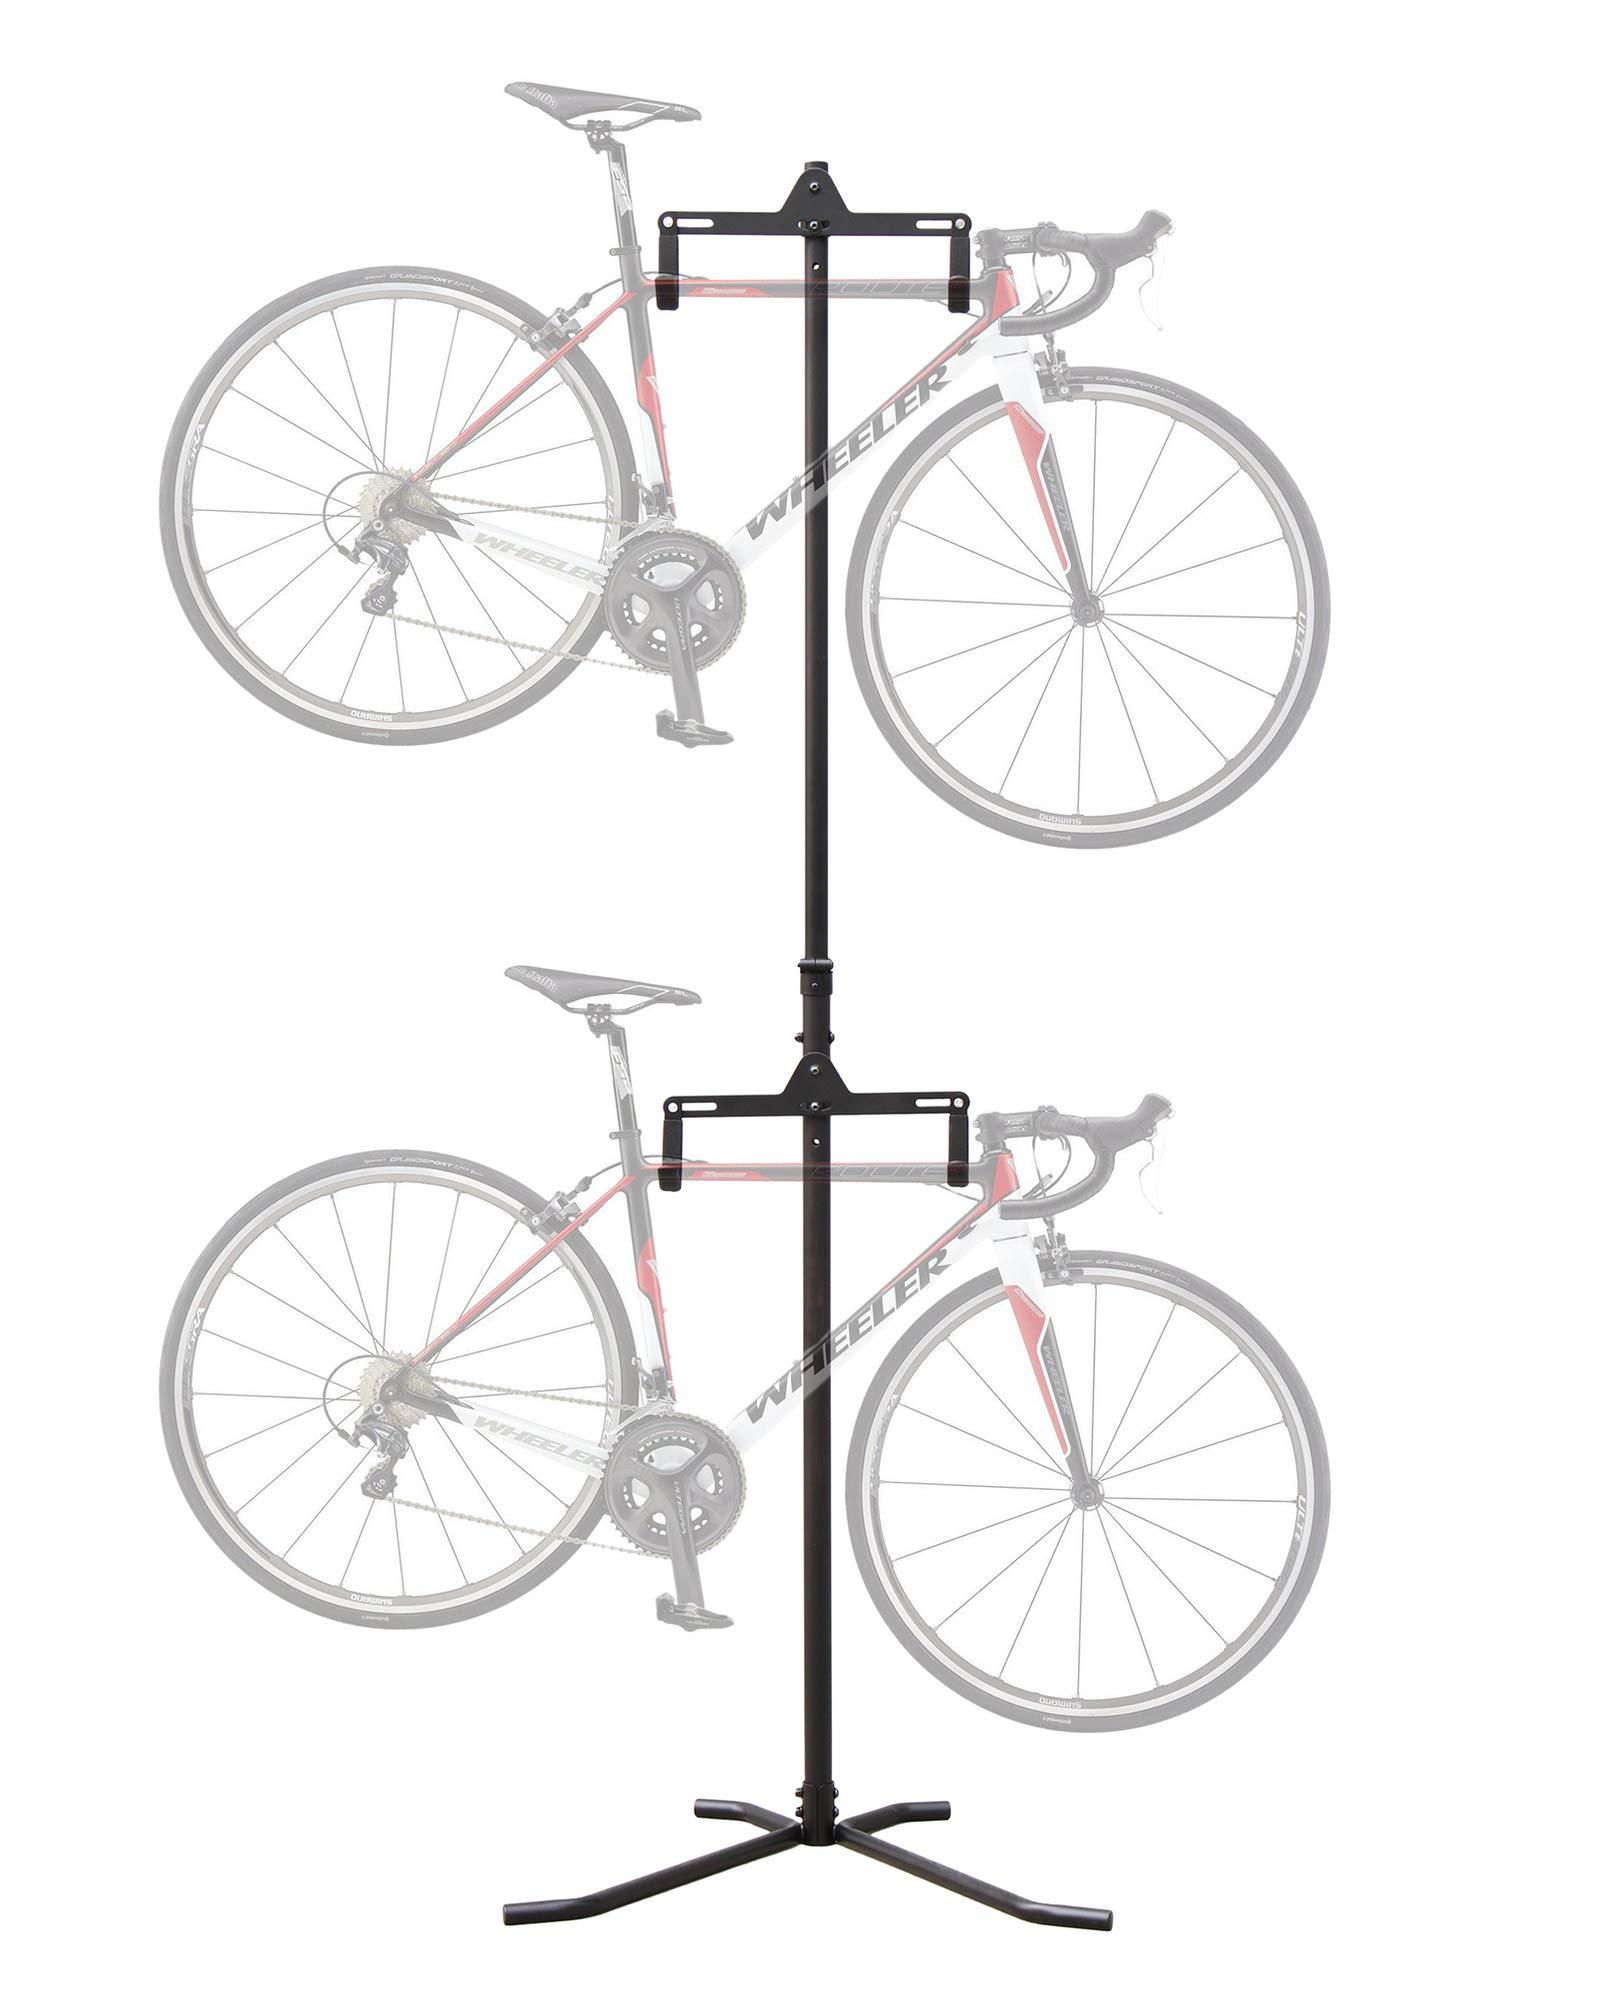 CyclingDeal 2 Bike Bicycle Floor Rack Stand